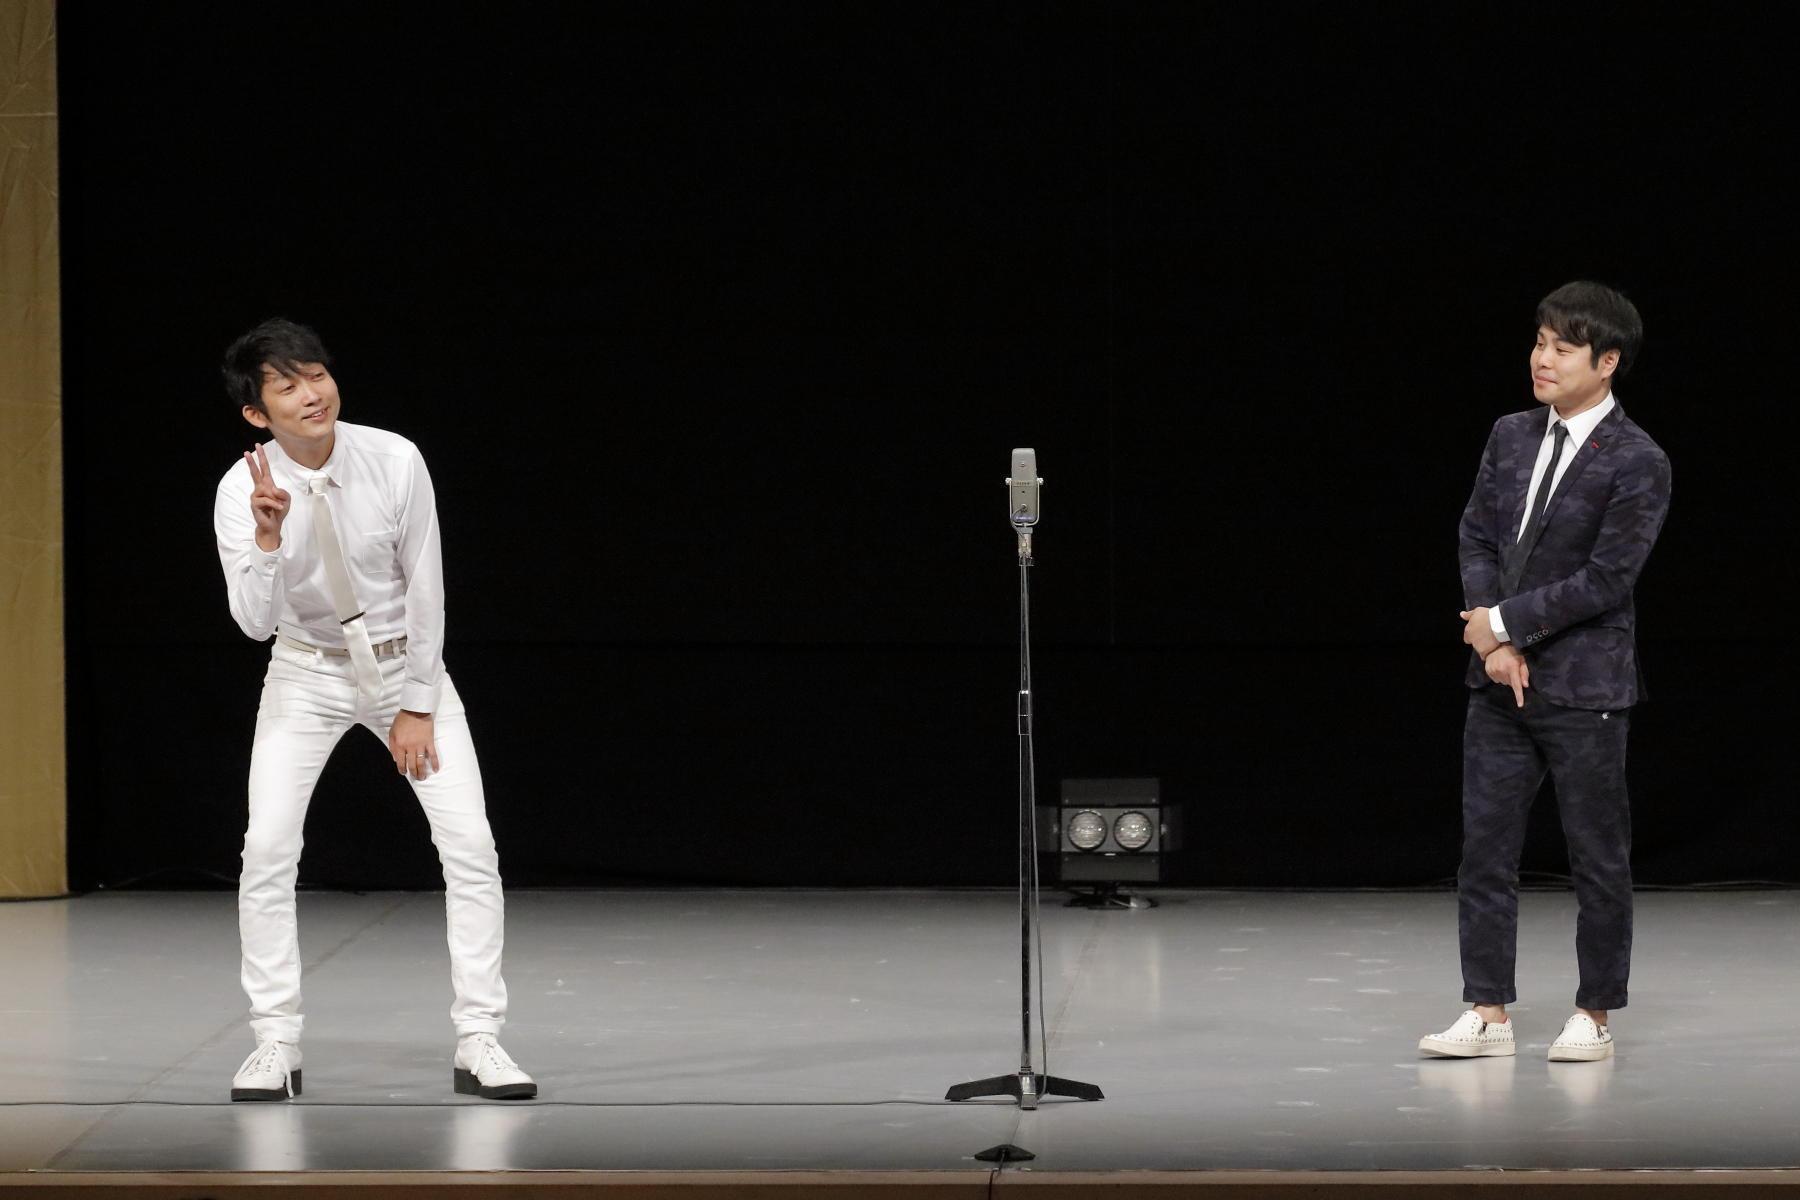 http://news.yoshimoto.co.jp/20171112123744-1da21b9fea341520aab73627f82b84aa4213a95c.jpg